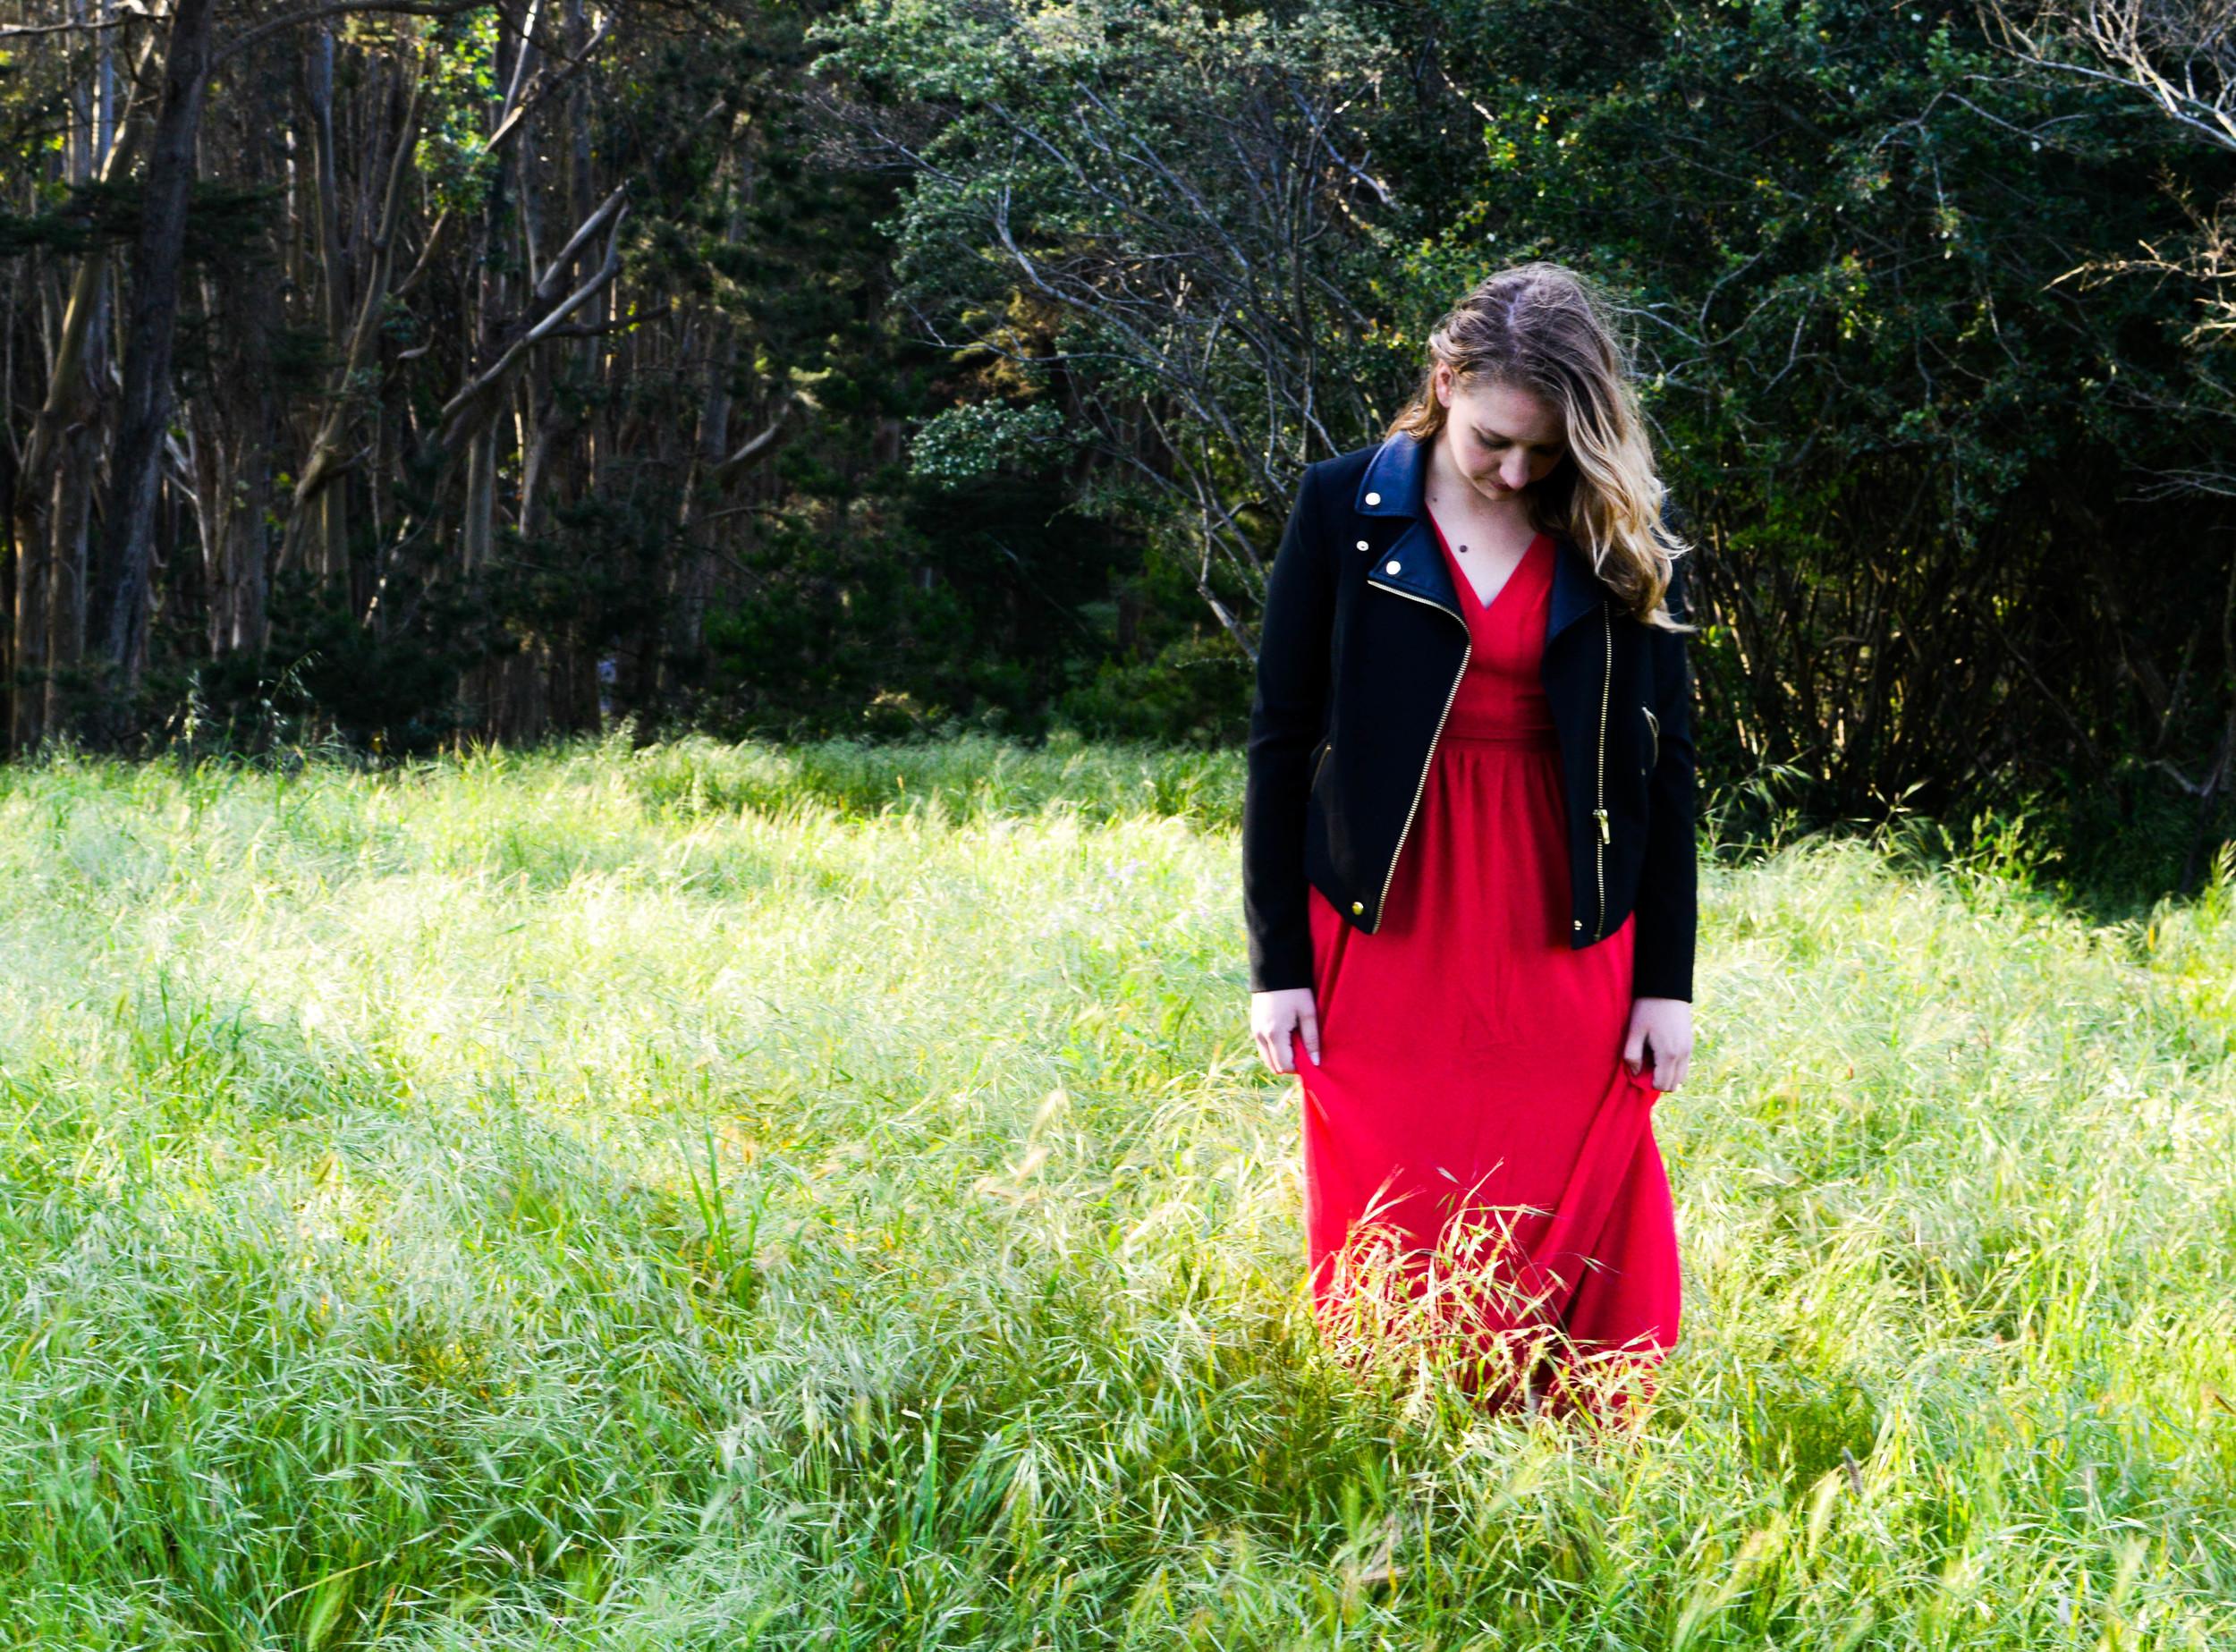 Girl in a red dress walking through field